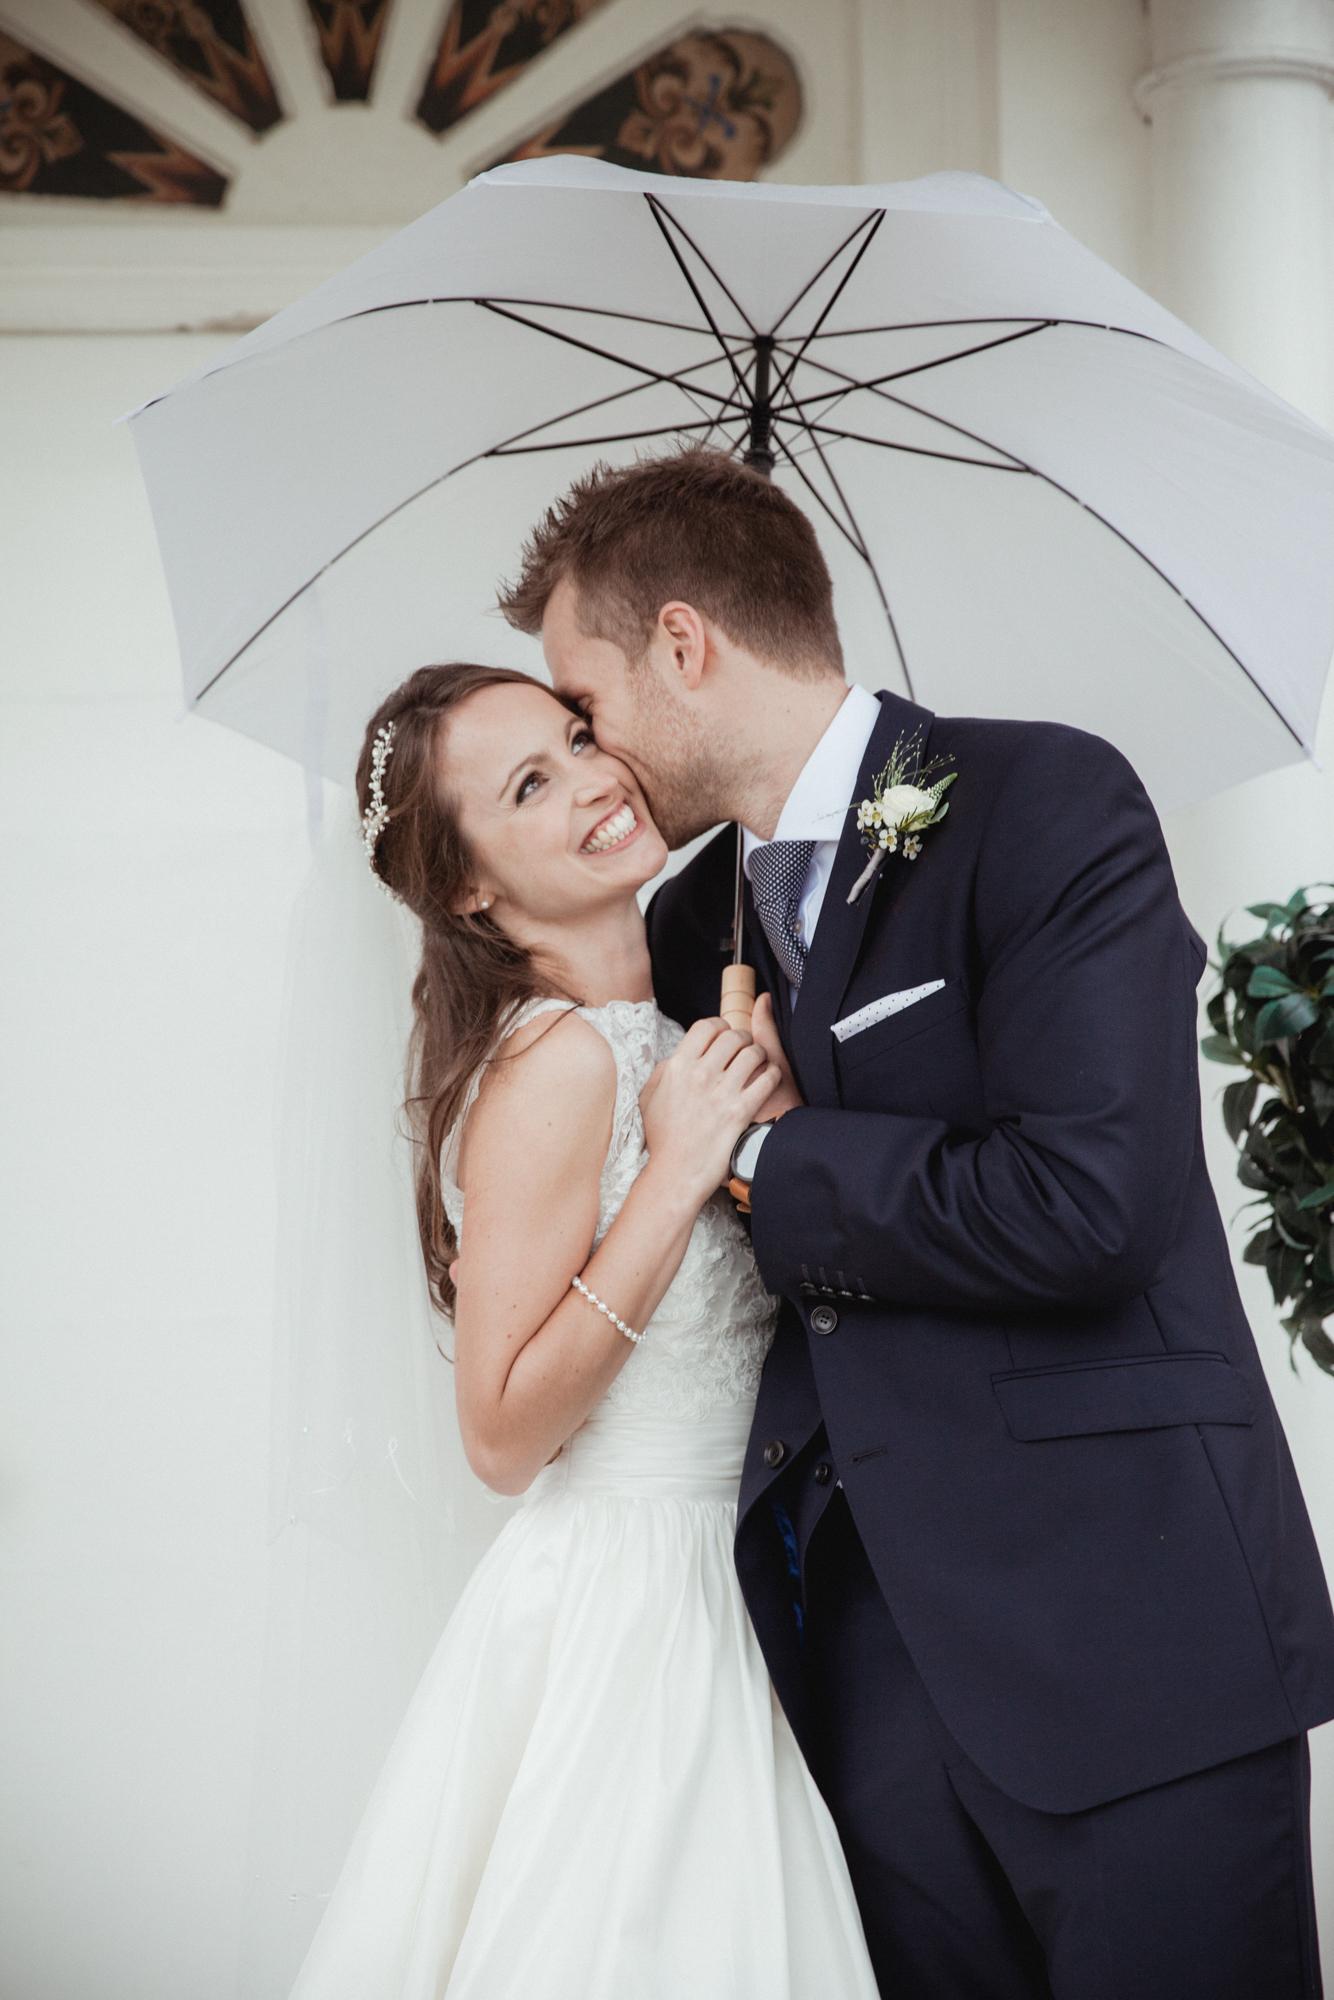 bradbourne house wedding umbrella kent